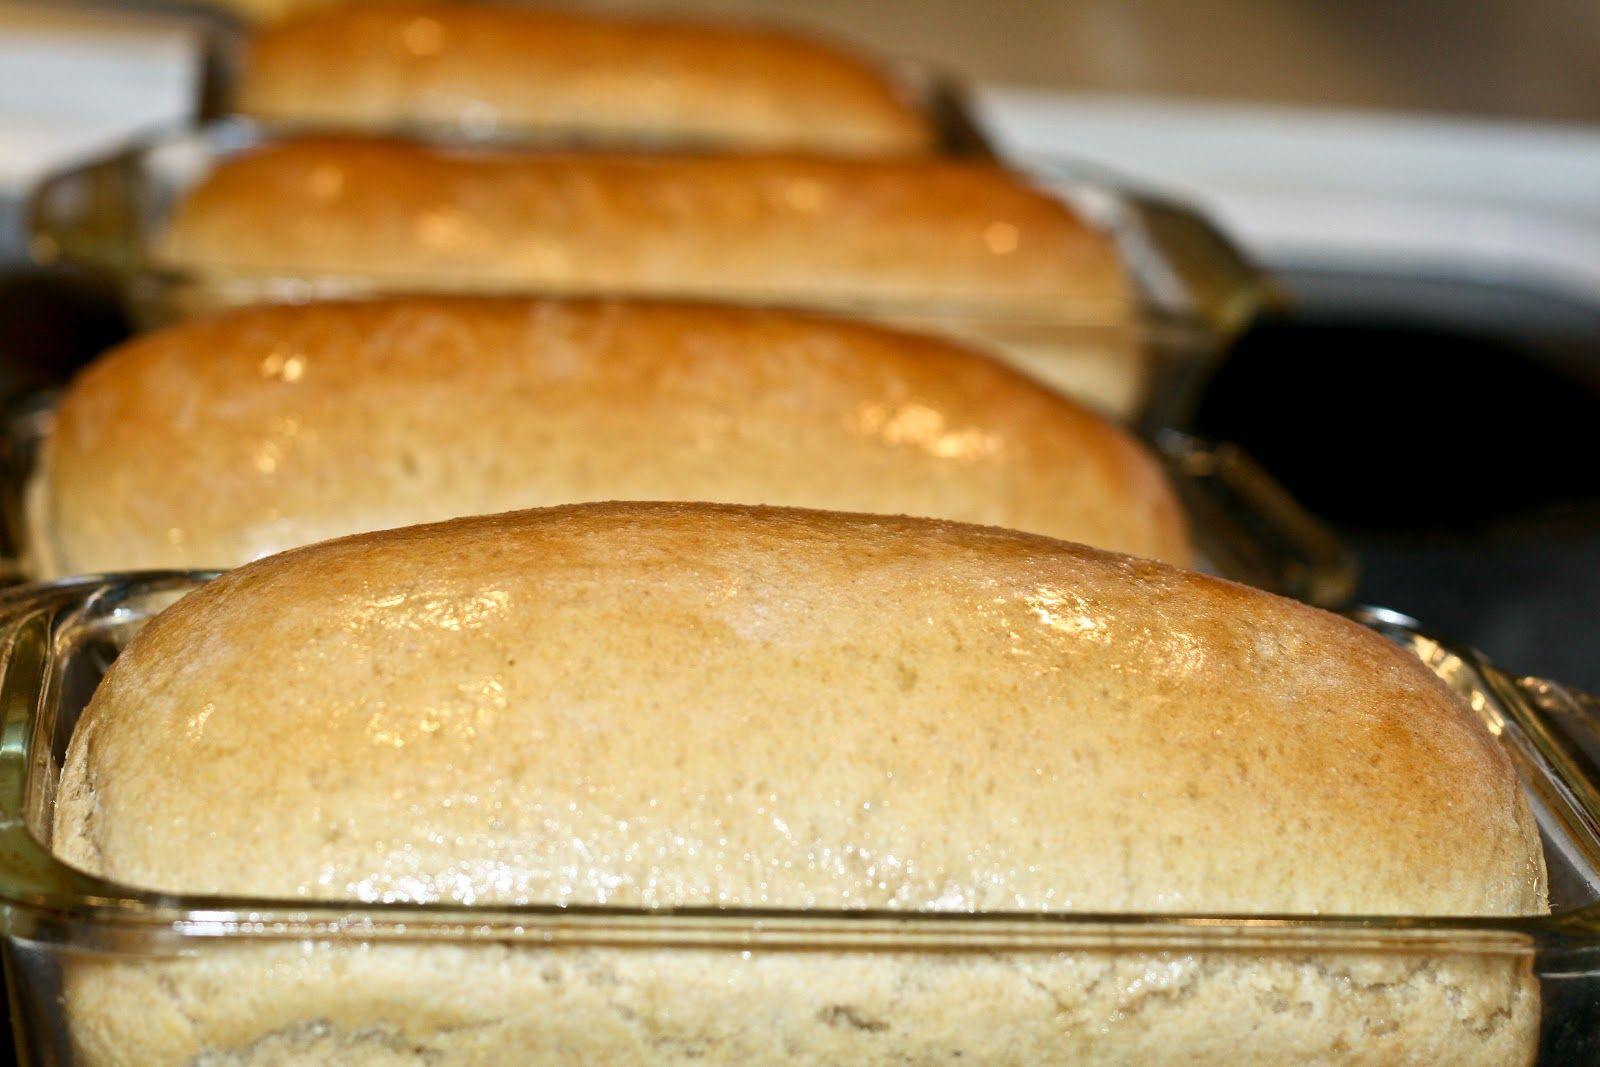 Muncher Cruncher: Homemade Whole Grain Kamut Bread